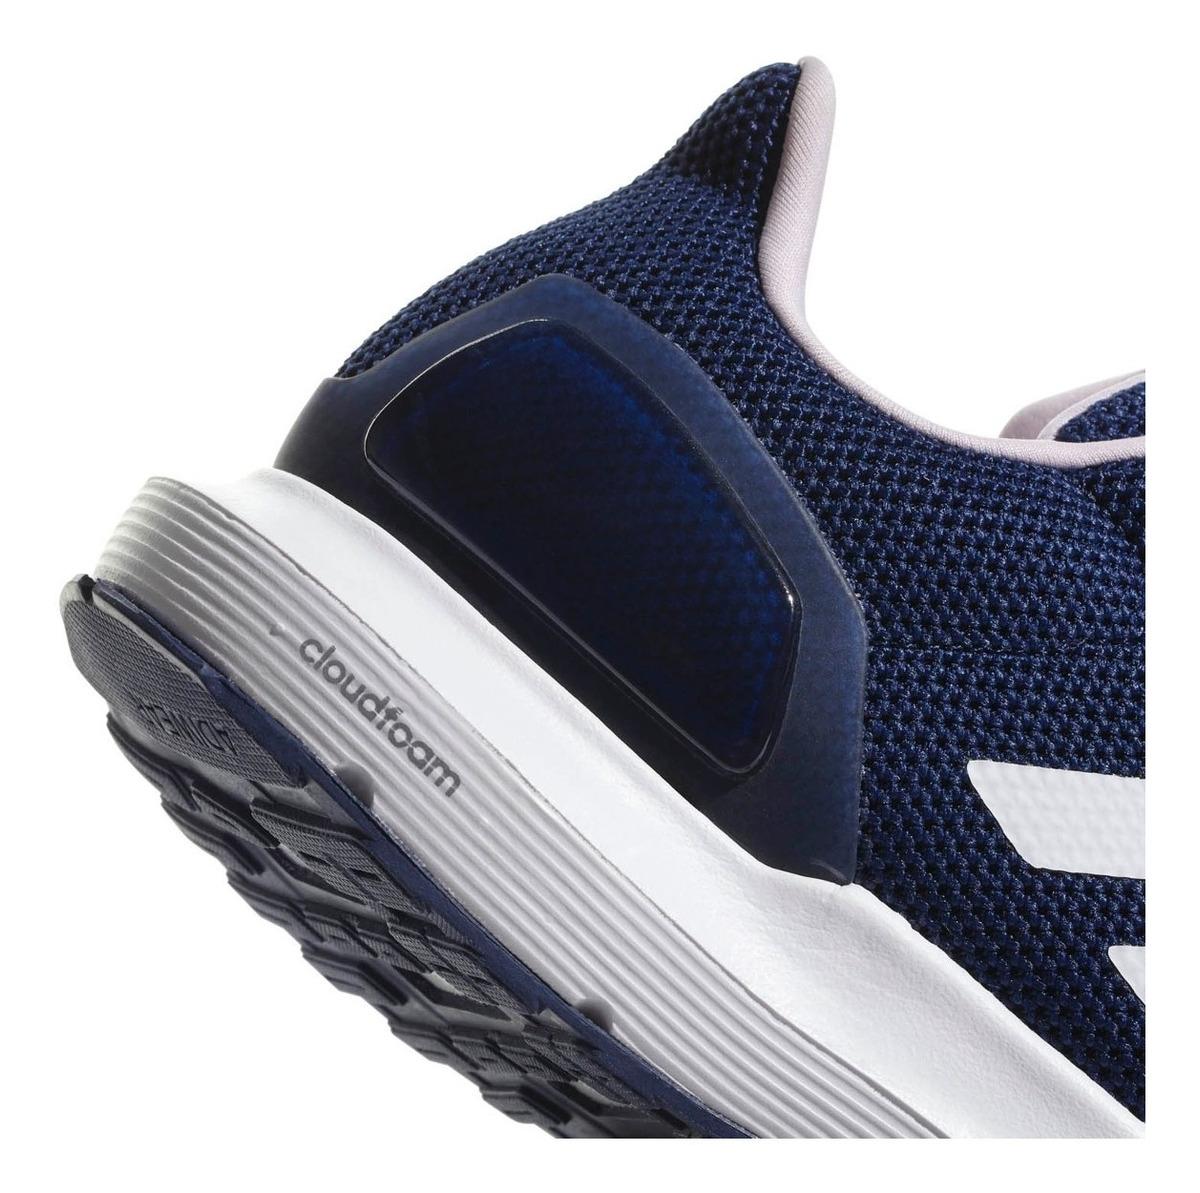 Zapatillas adidas Cosmic 2 b44889 adidas Performance